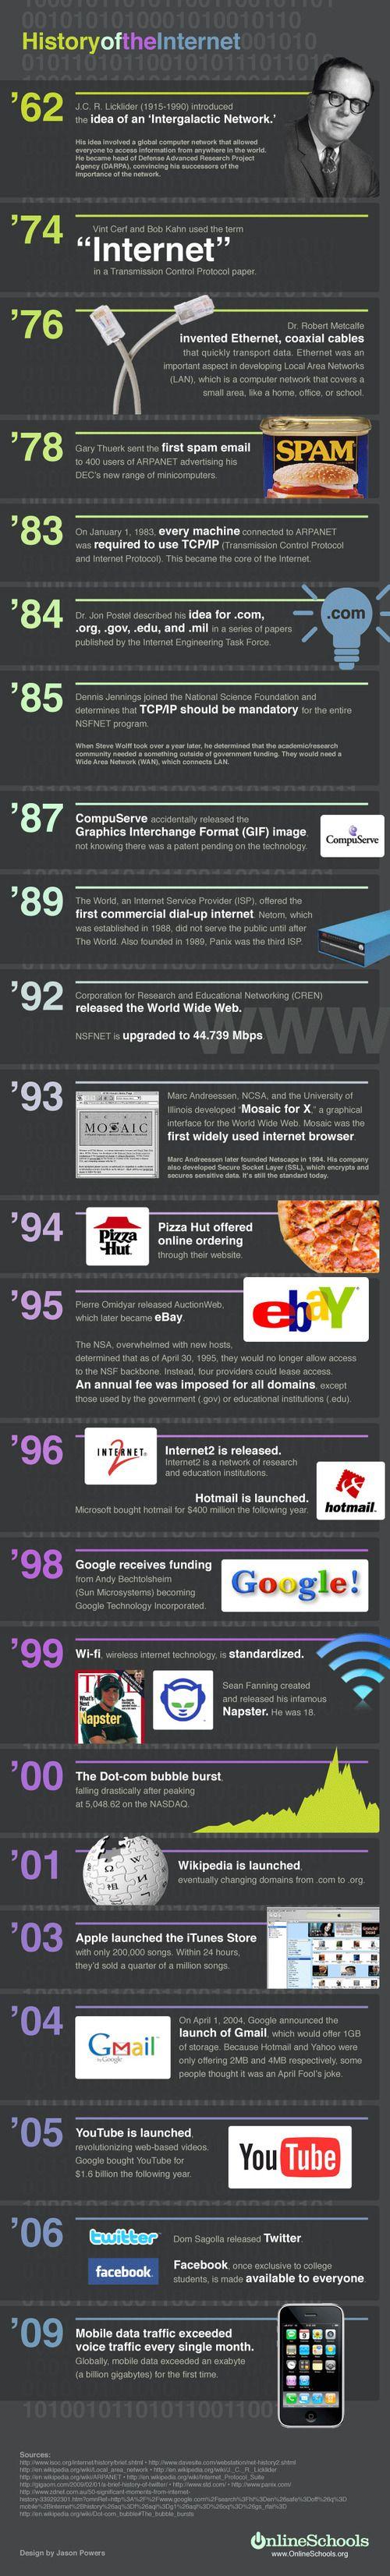 Internet Geschichte